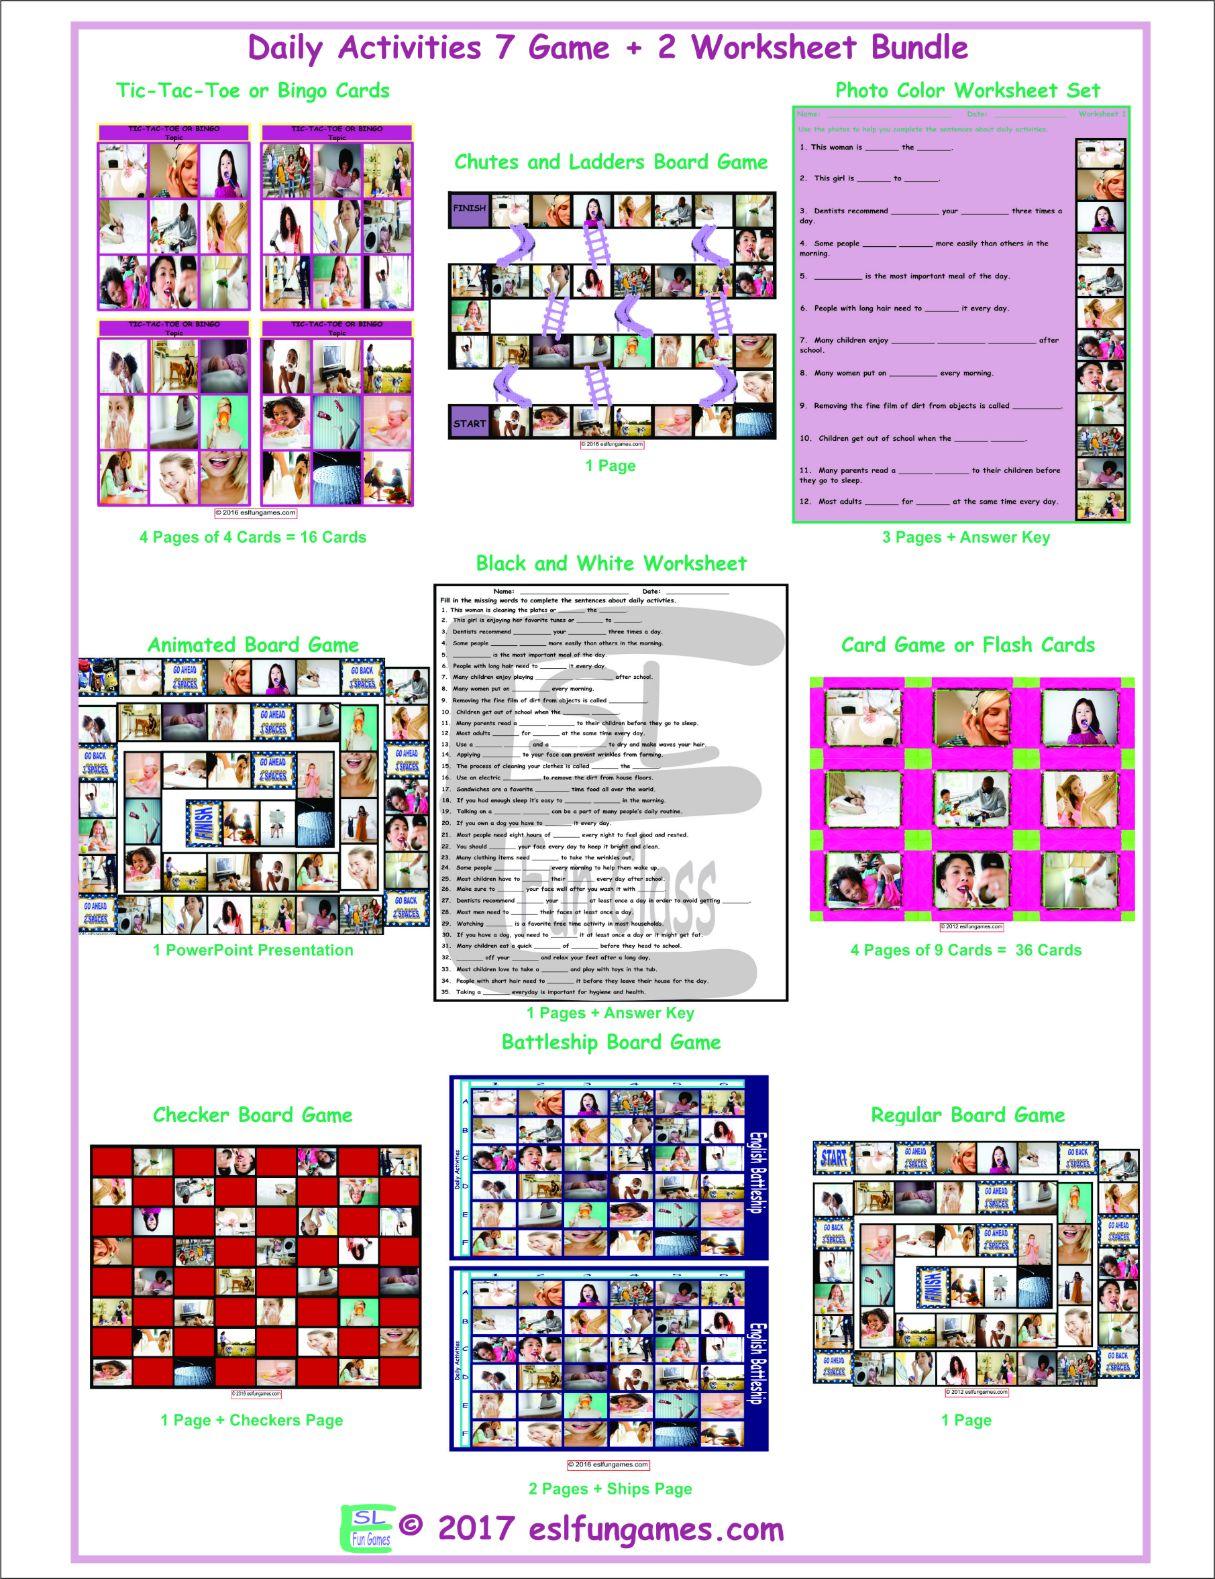 Daily Activities 7 Game Plus 2 Worksheet Bundle